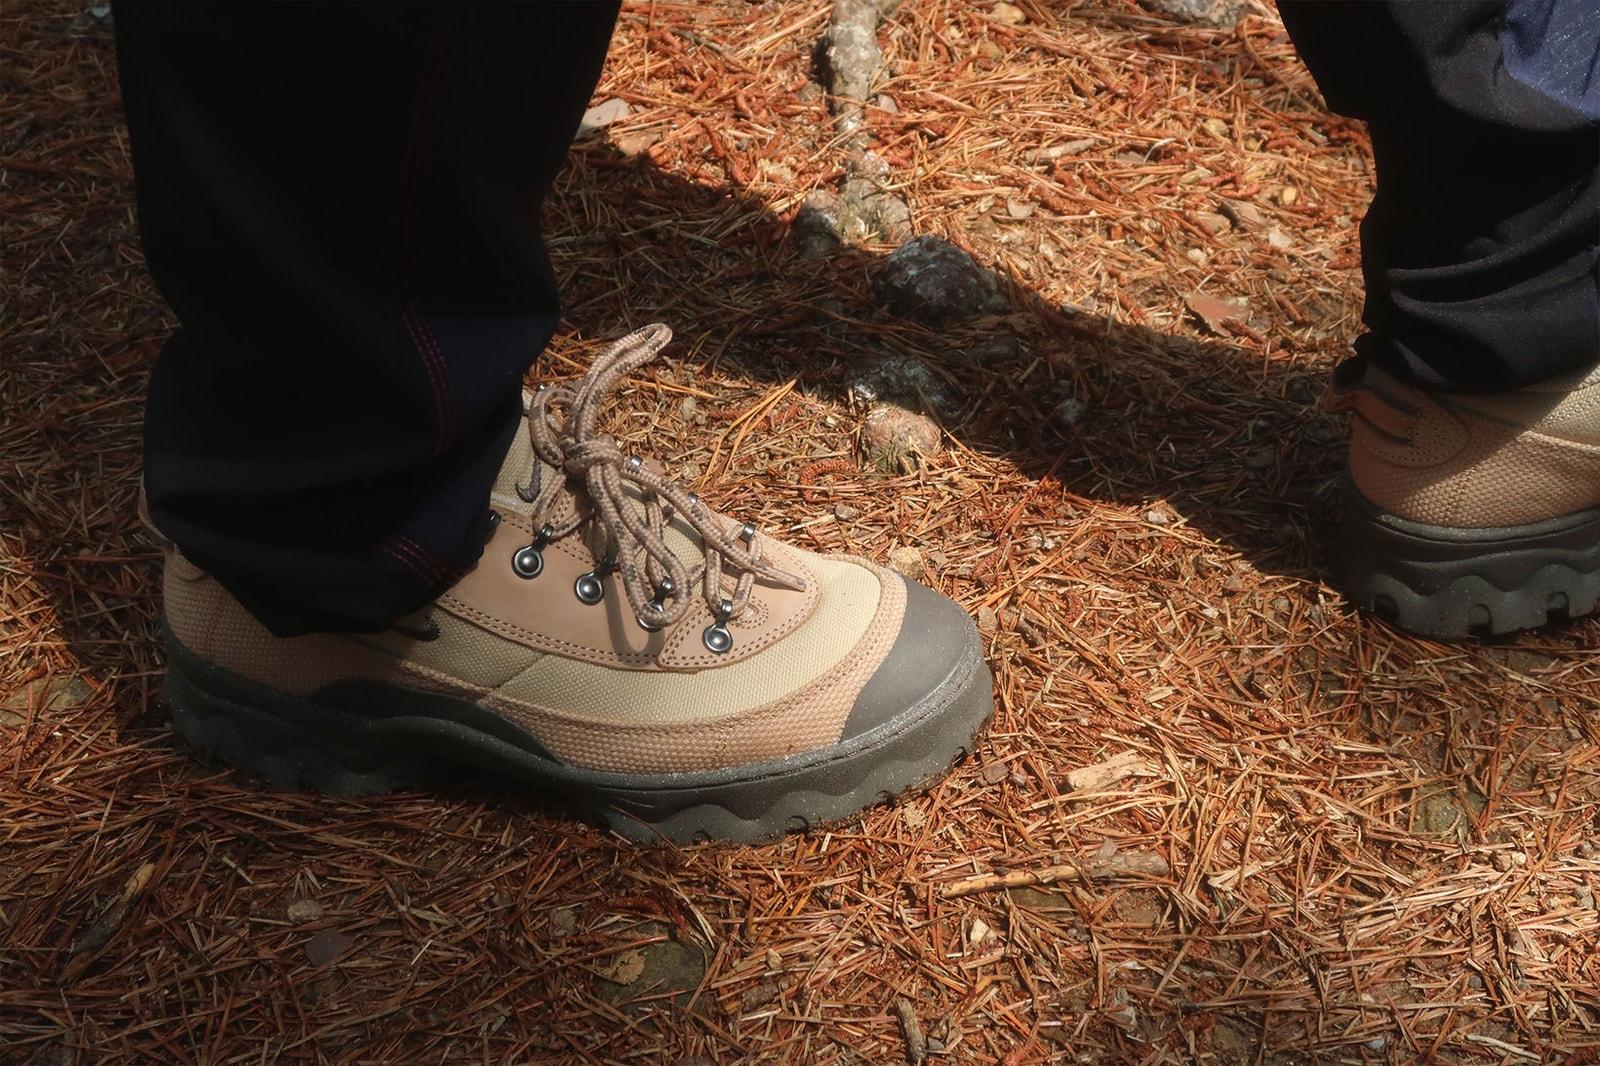 nike lahar low womens hiking shoes grain beige sneakers review